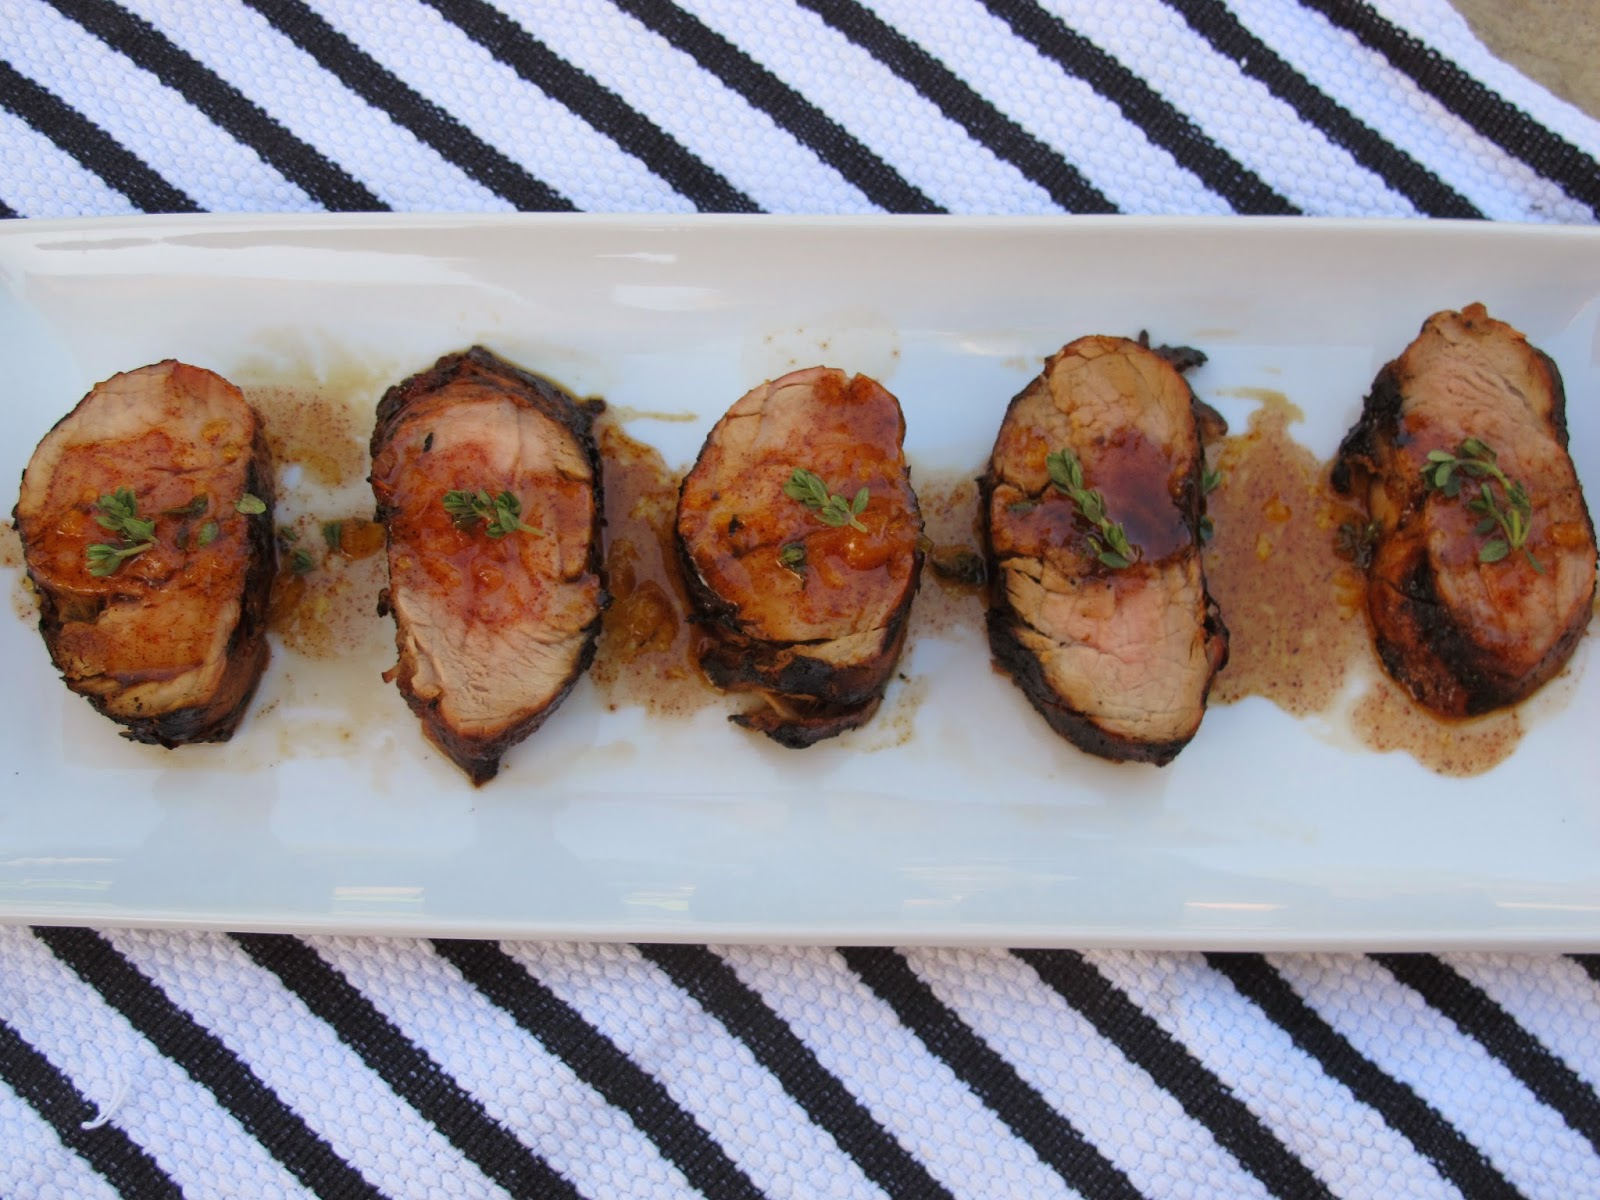 Peach-Maple-Chile Glazed Grilled Pork Tenderloin